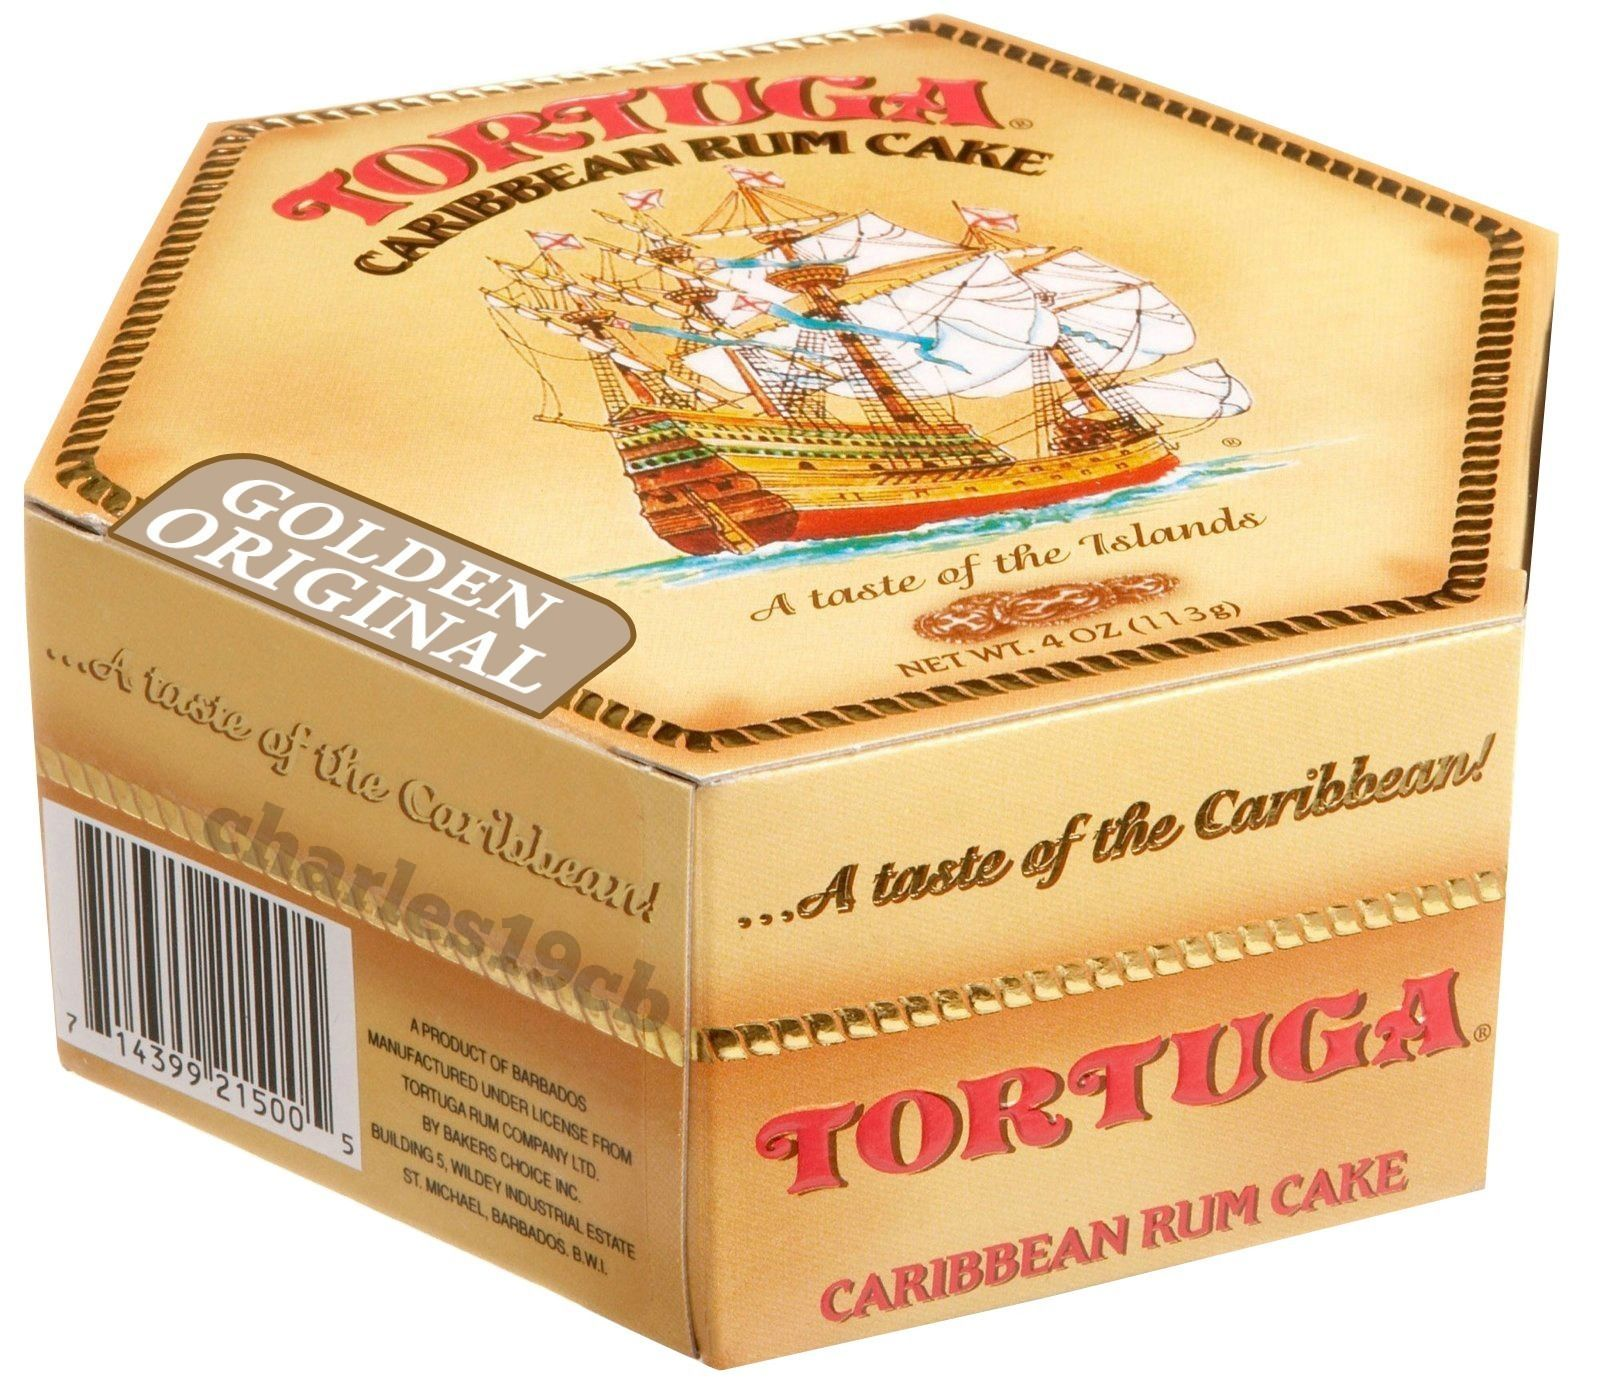 Details about Tortuga Caribbean Rum Cake, 4 oz Golden